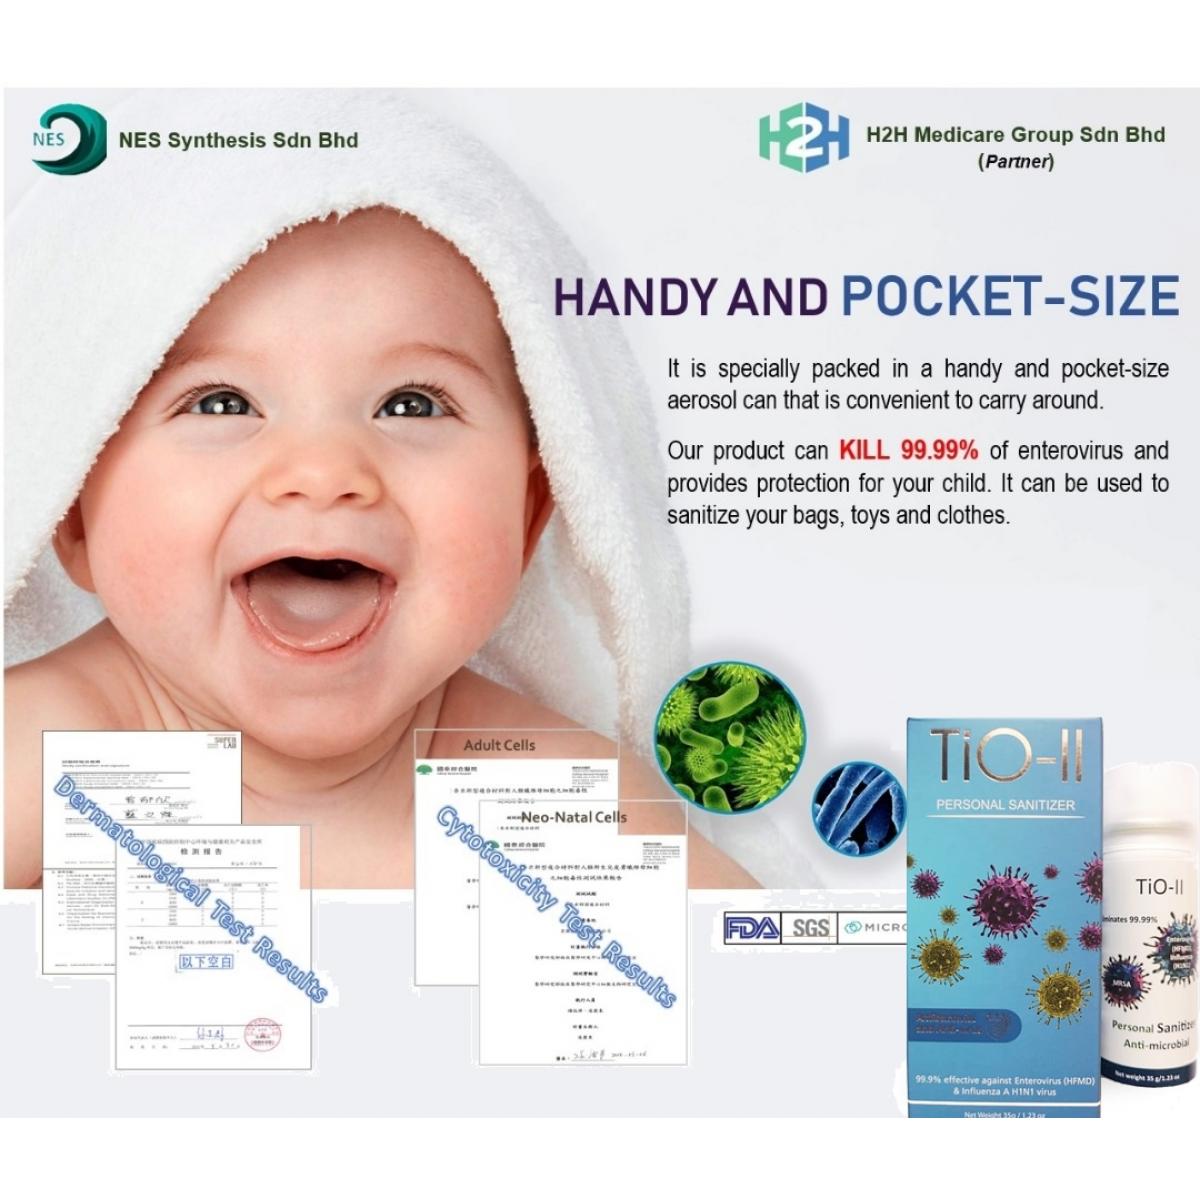 TiO-II Personal Steriliser Antibacterial Antivirus Aerosol Spray 35g - NEW